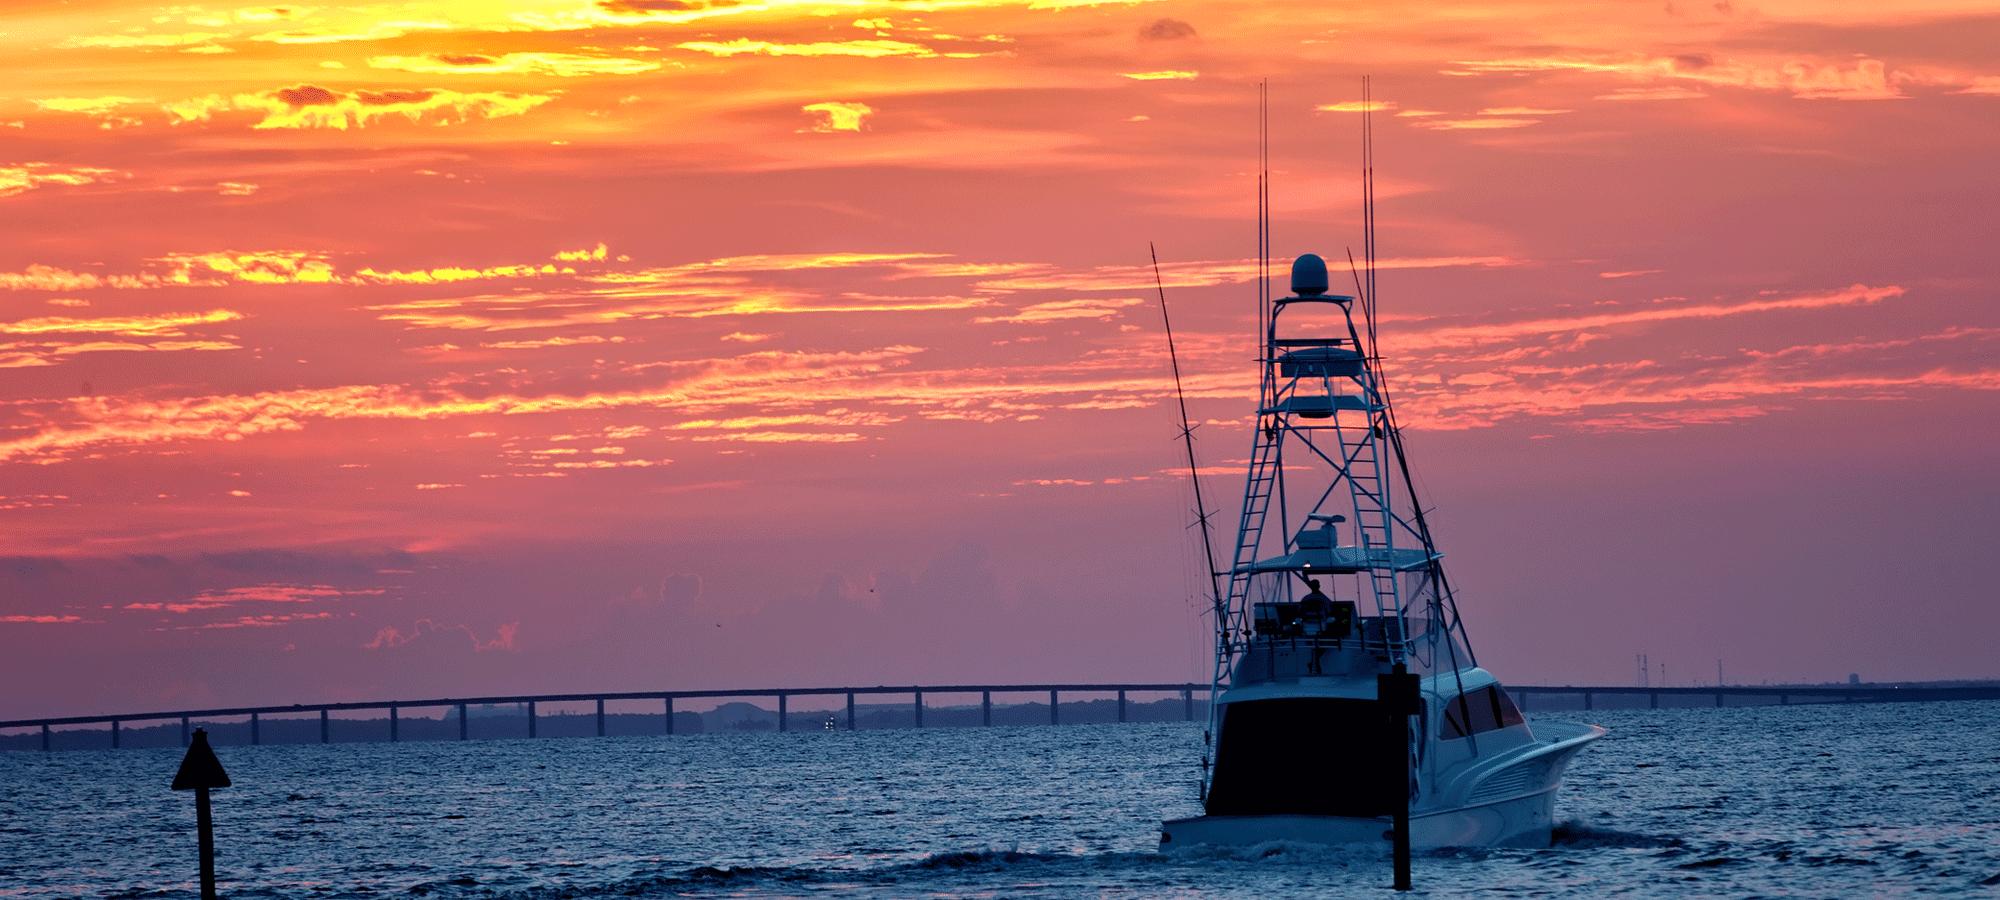 destin fishing boat at sunset